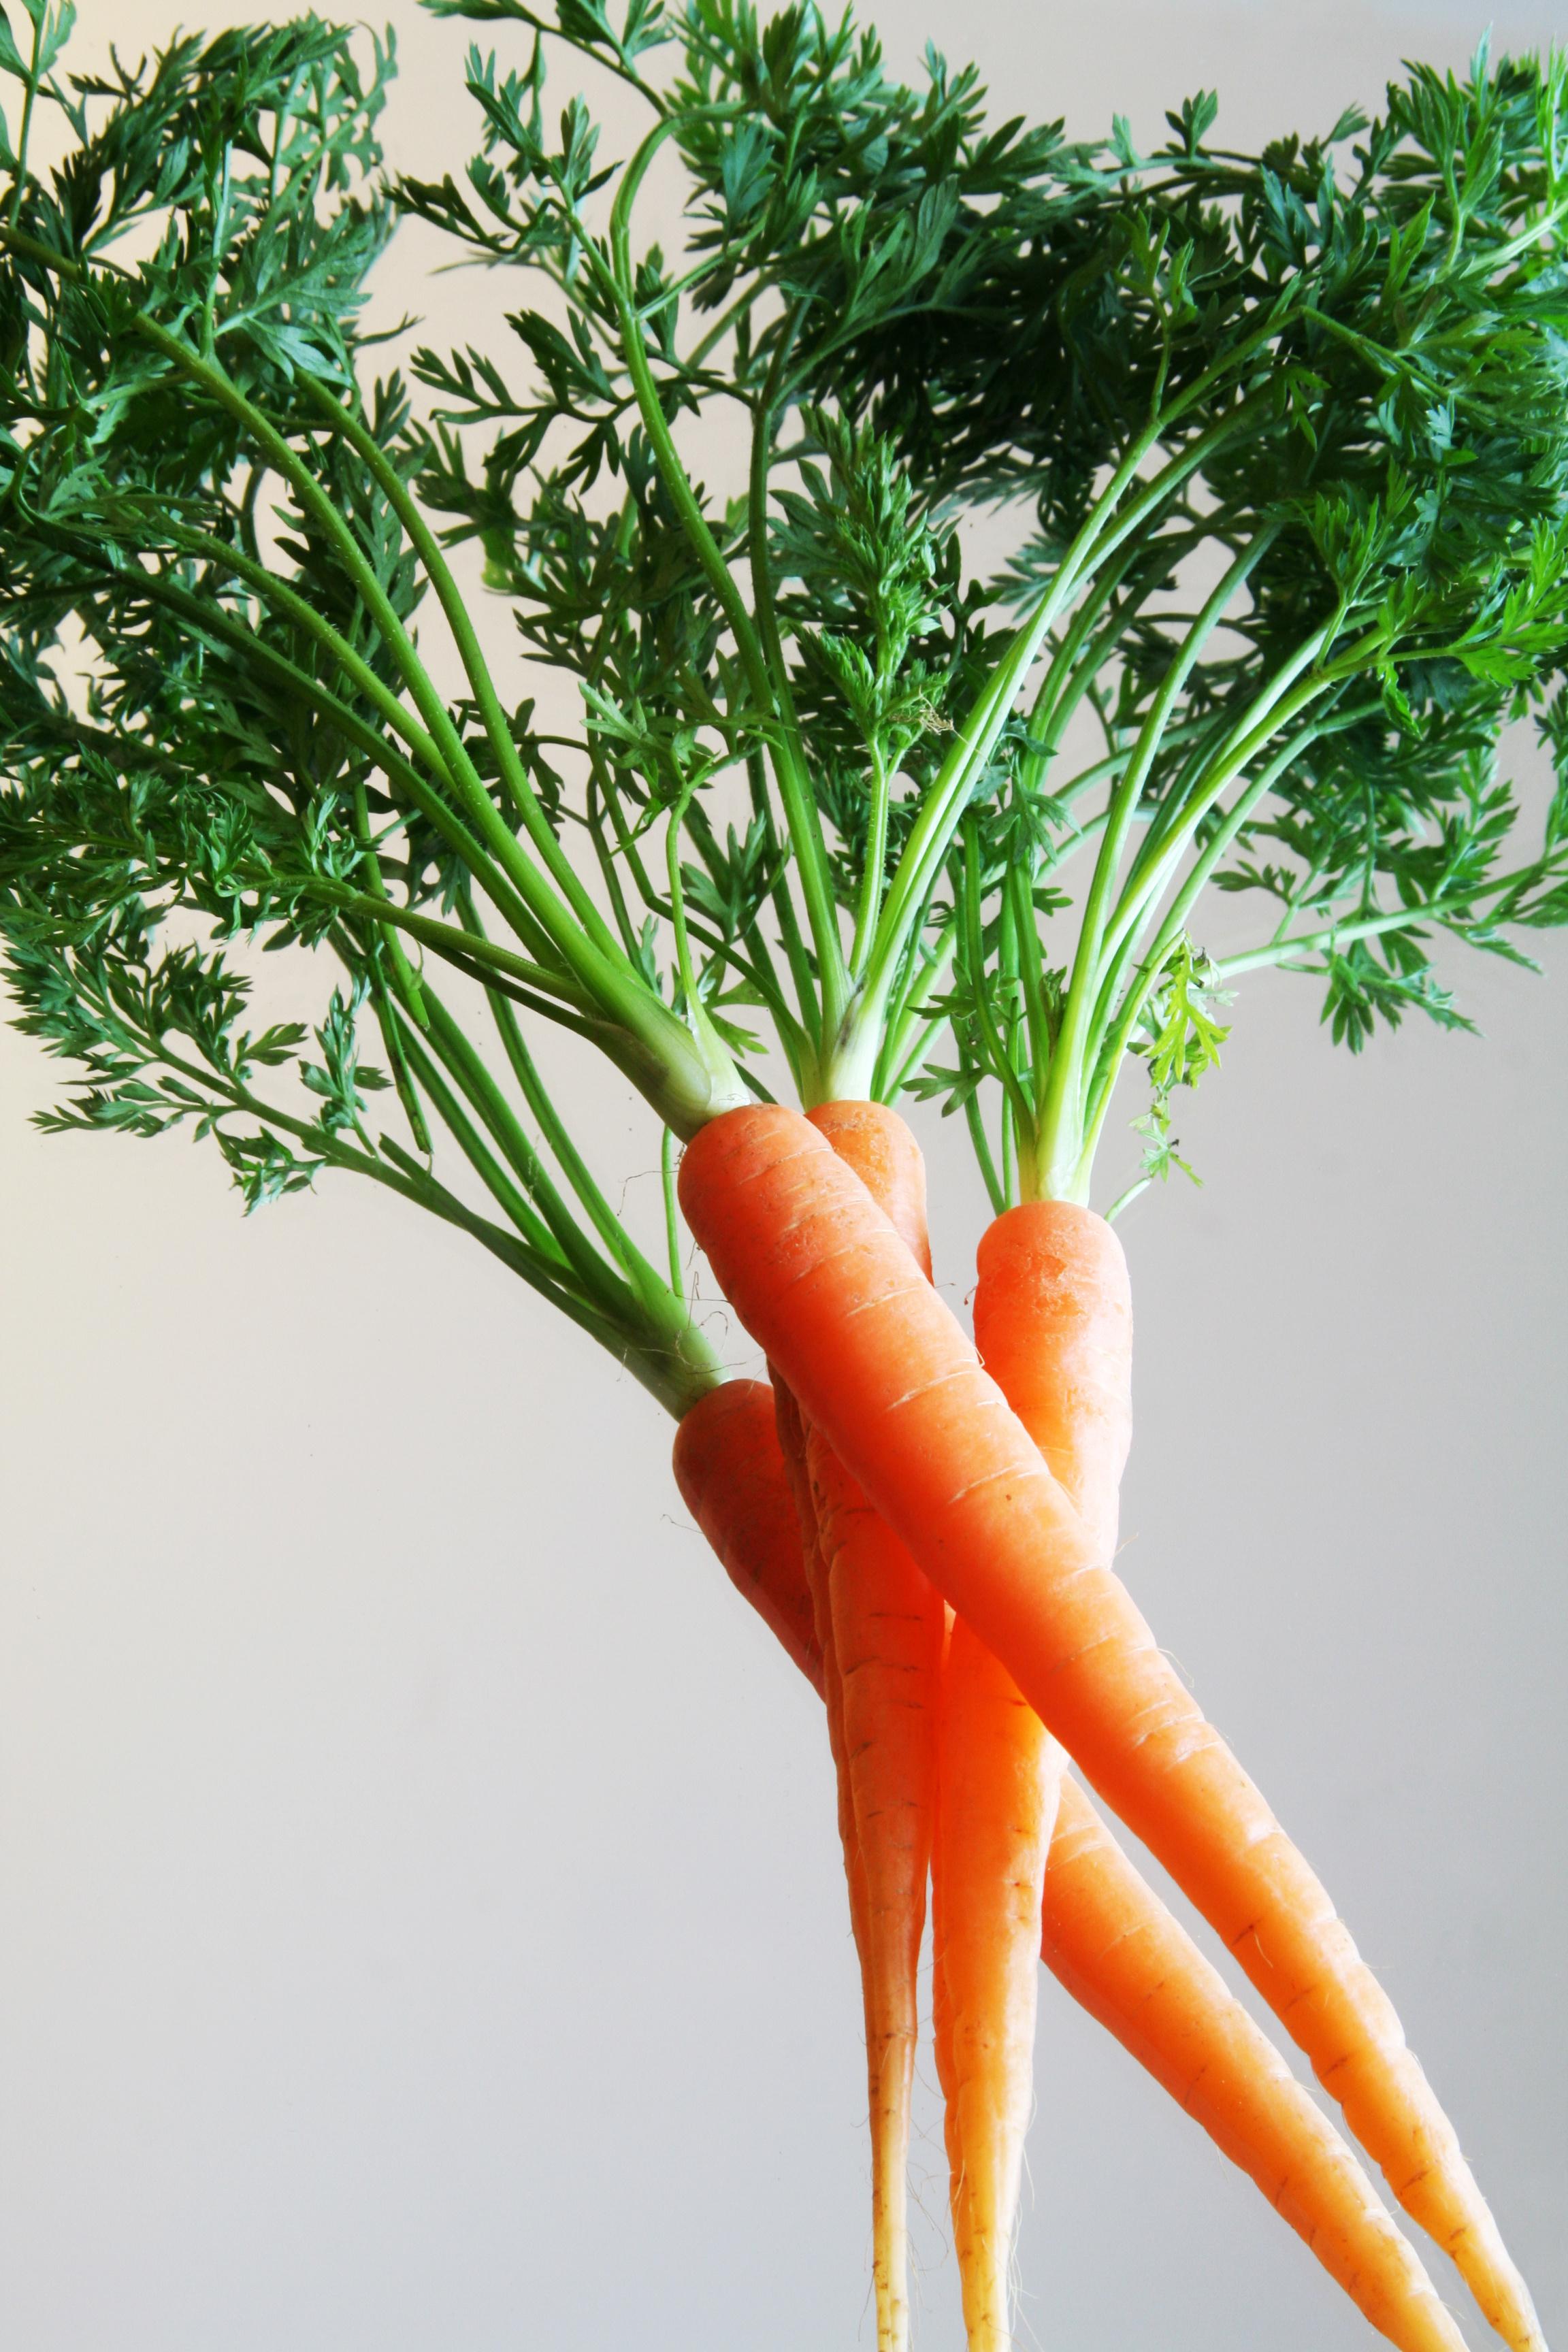 huile de carotte, huile de carotte bronzage, huile essentielle de carotte, huile végétale bio, phytothérapie